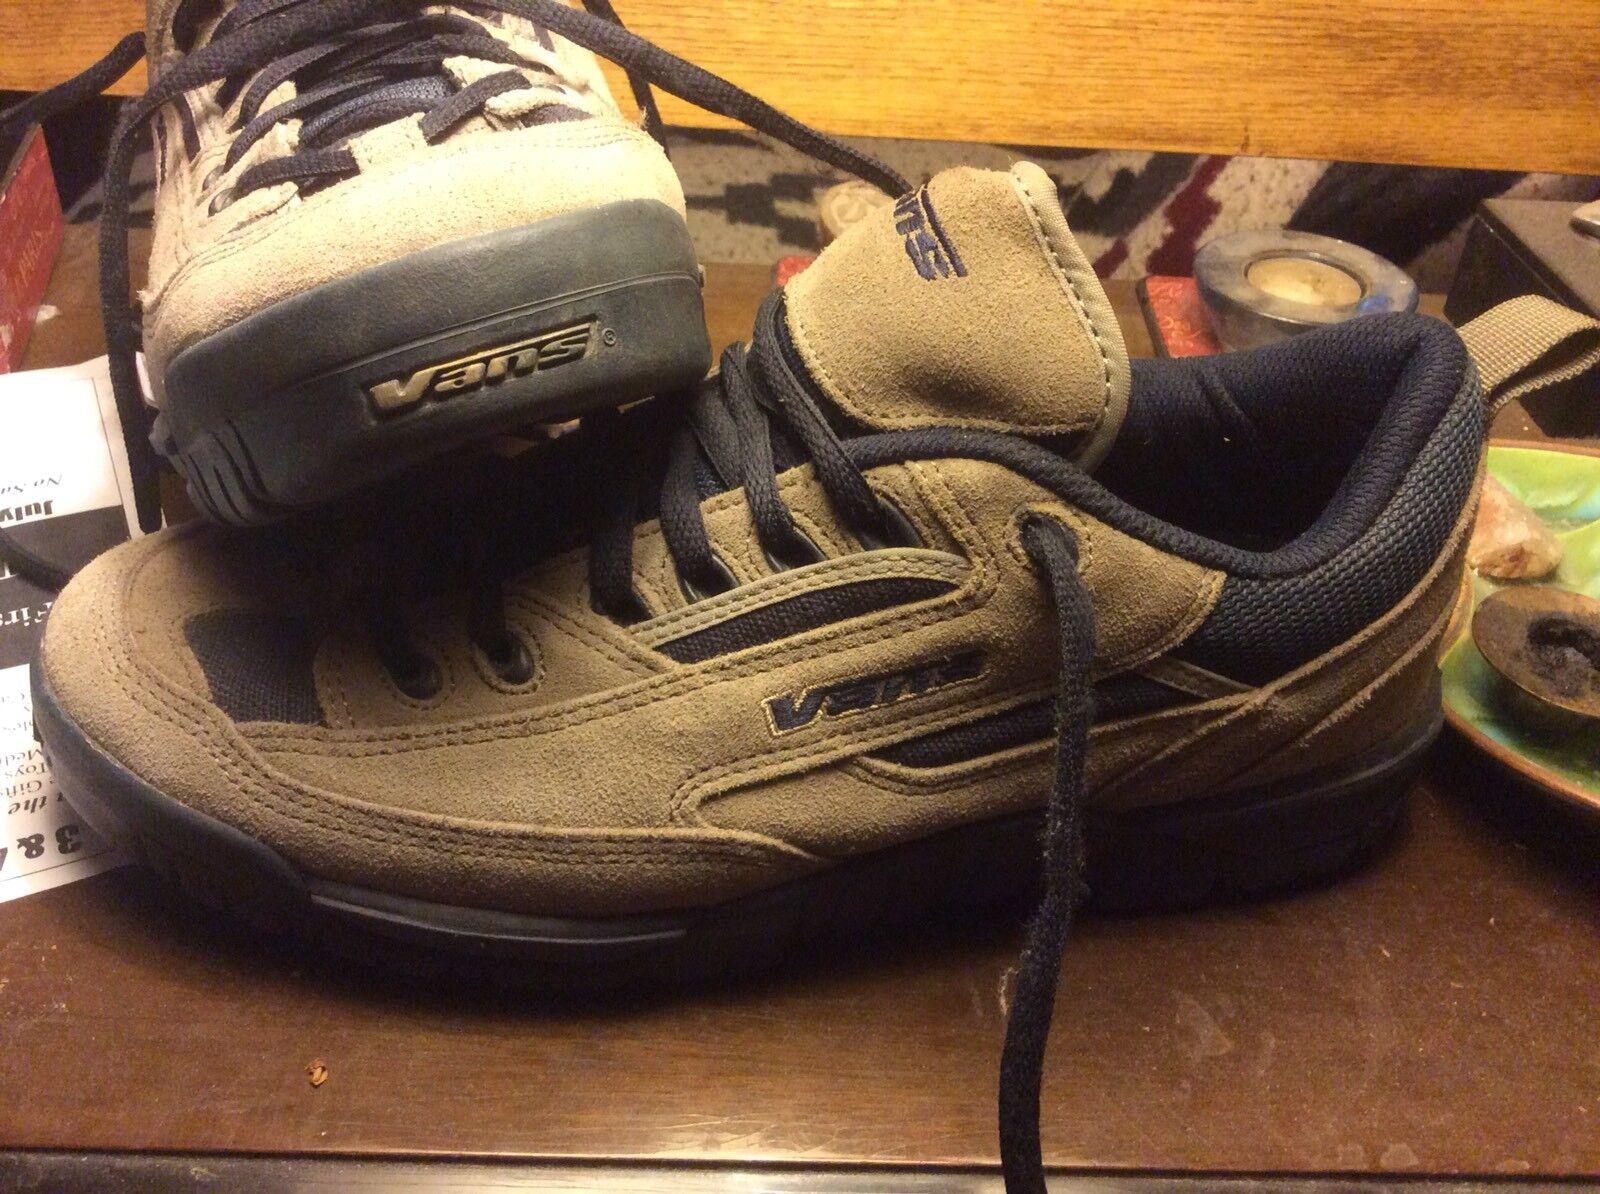 Very Rare! 1999 Men's Vans Padded Tongue Alternate Logo Shoes Size 11